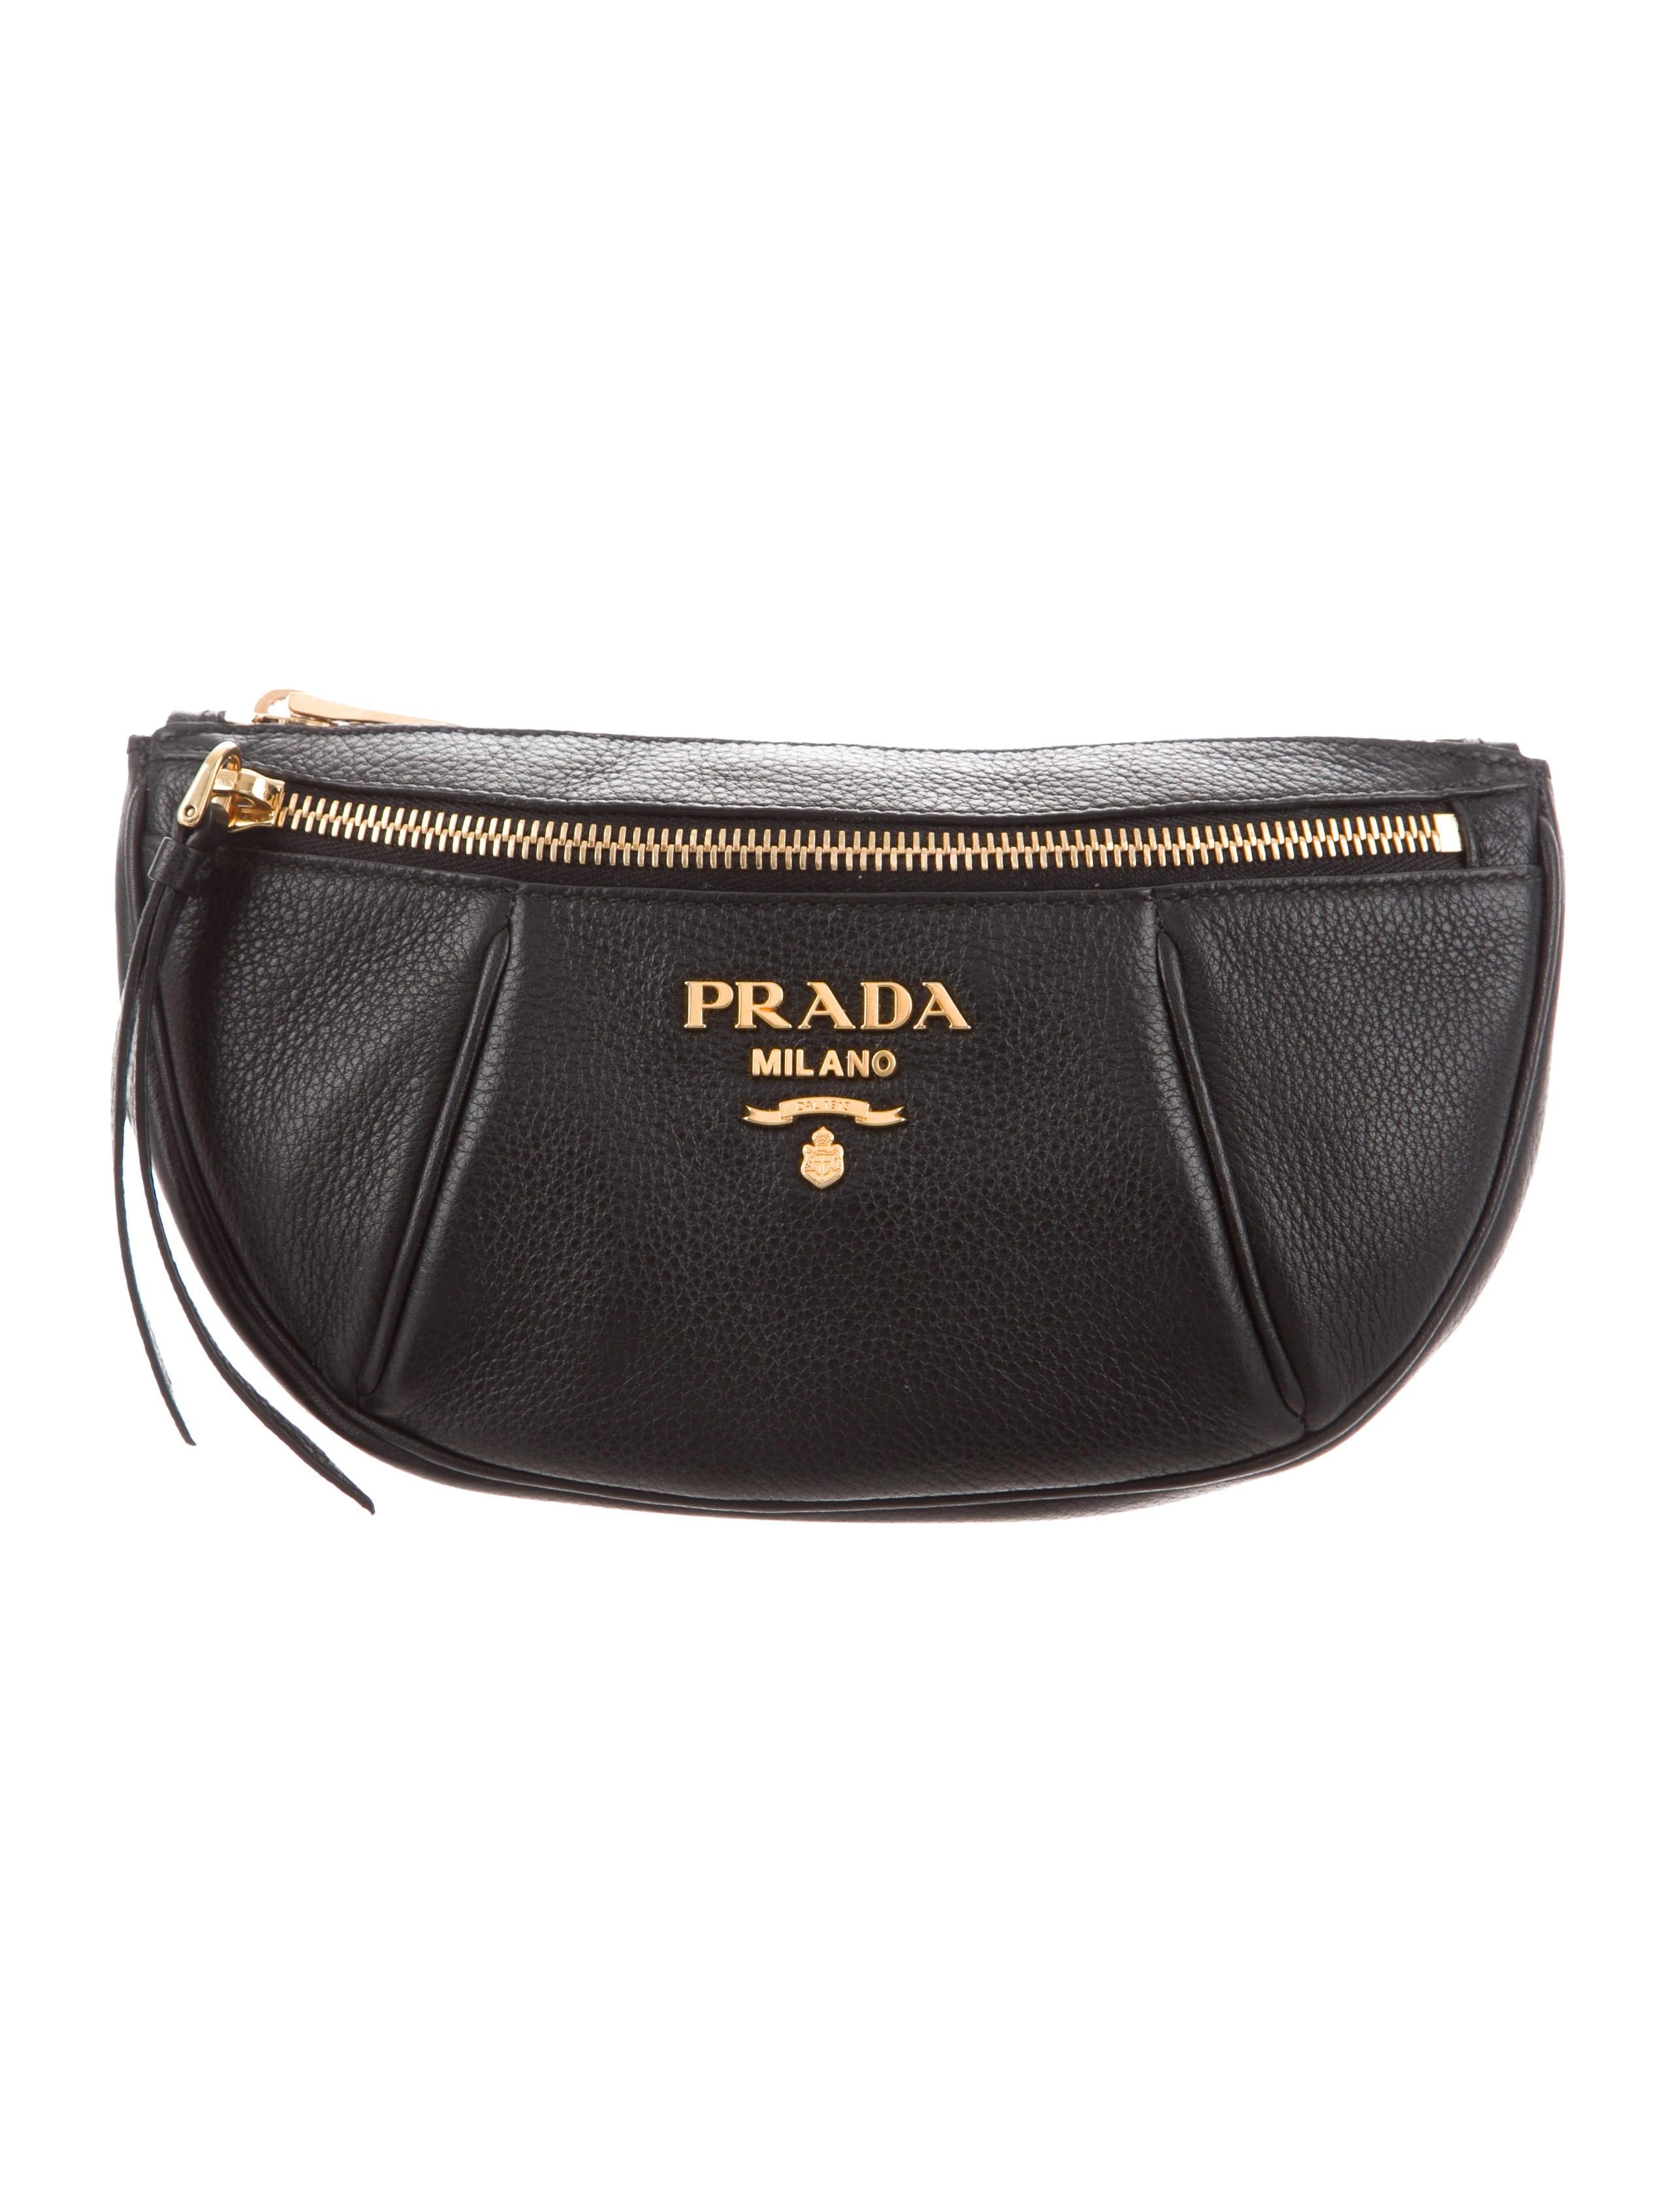 3135c8c737d3 Prada 2018 Vitello Daino Belt Bag - Handbags - PRA229168